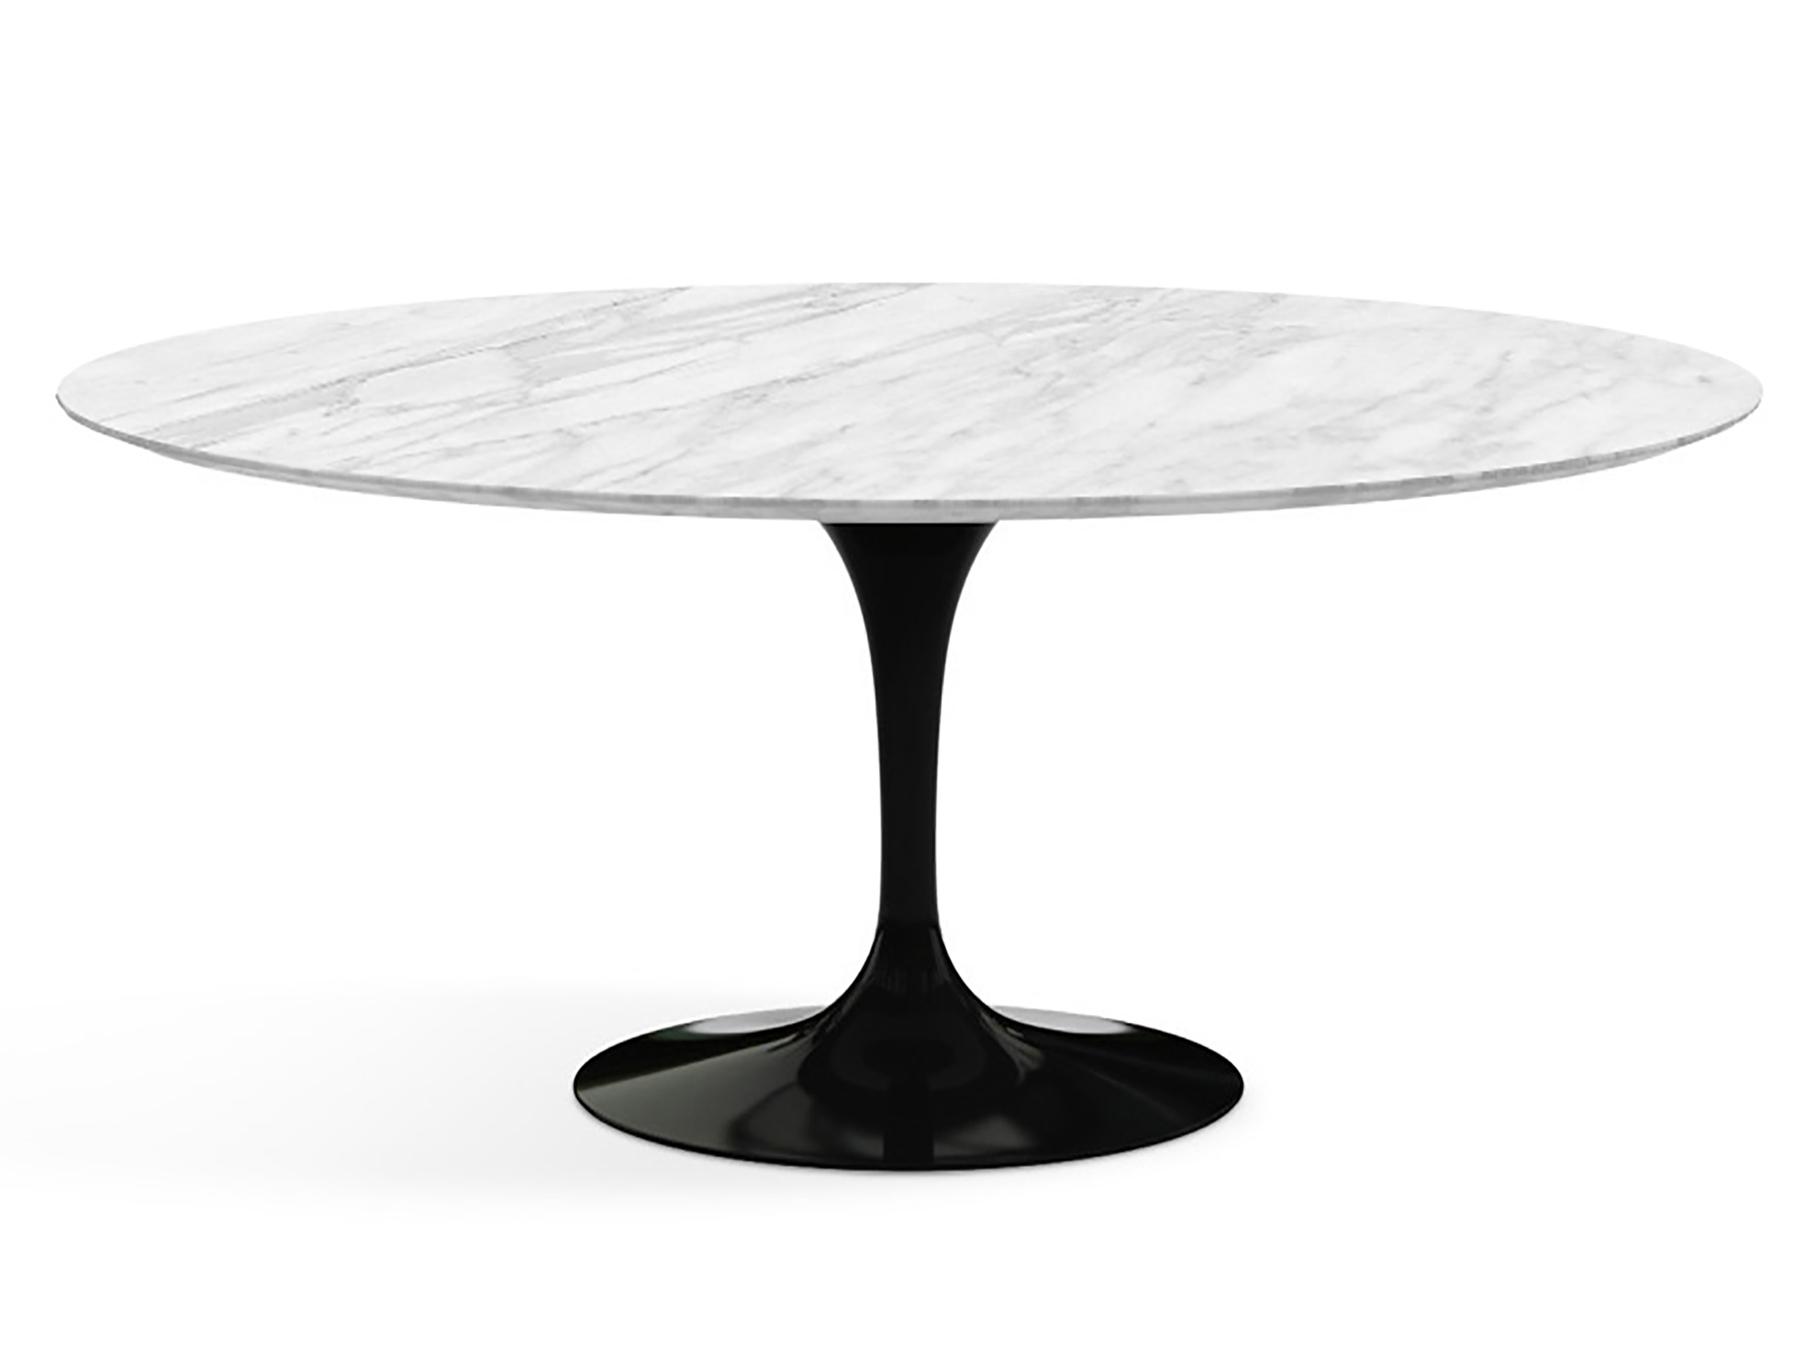 Кухонный стол ActualDesign 9981478 от thefurnish